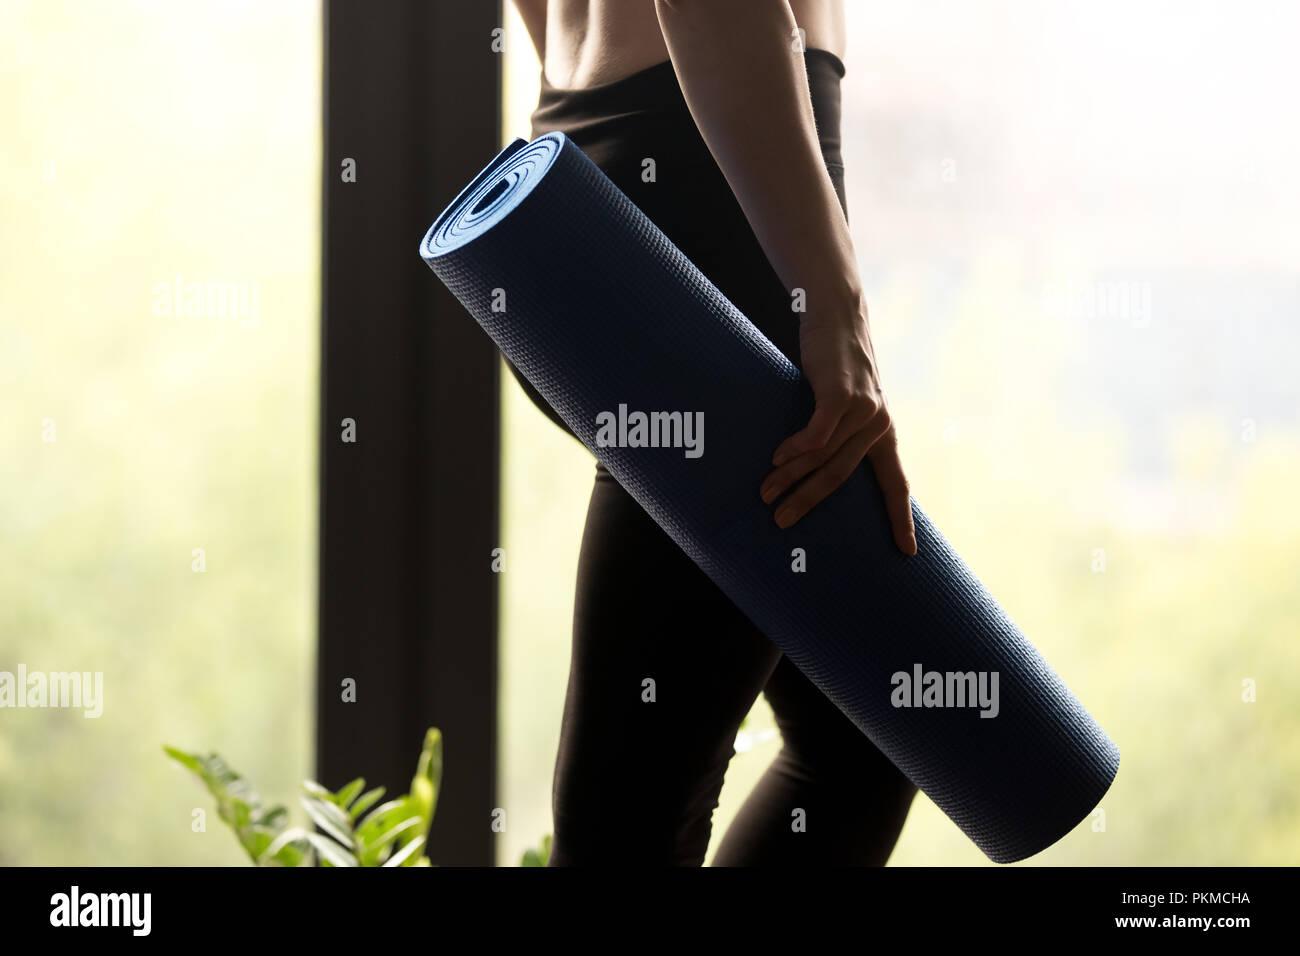 Sportliche Frau mit Yoga Matte, Nahaufnahme Stockbild